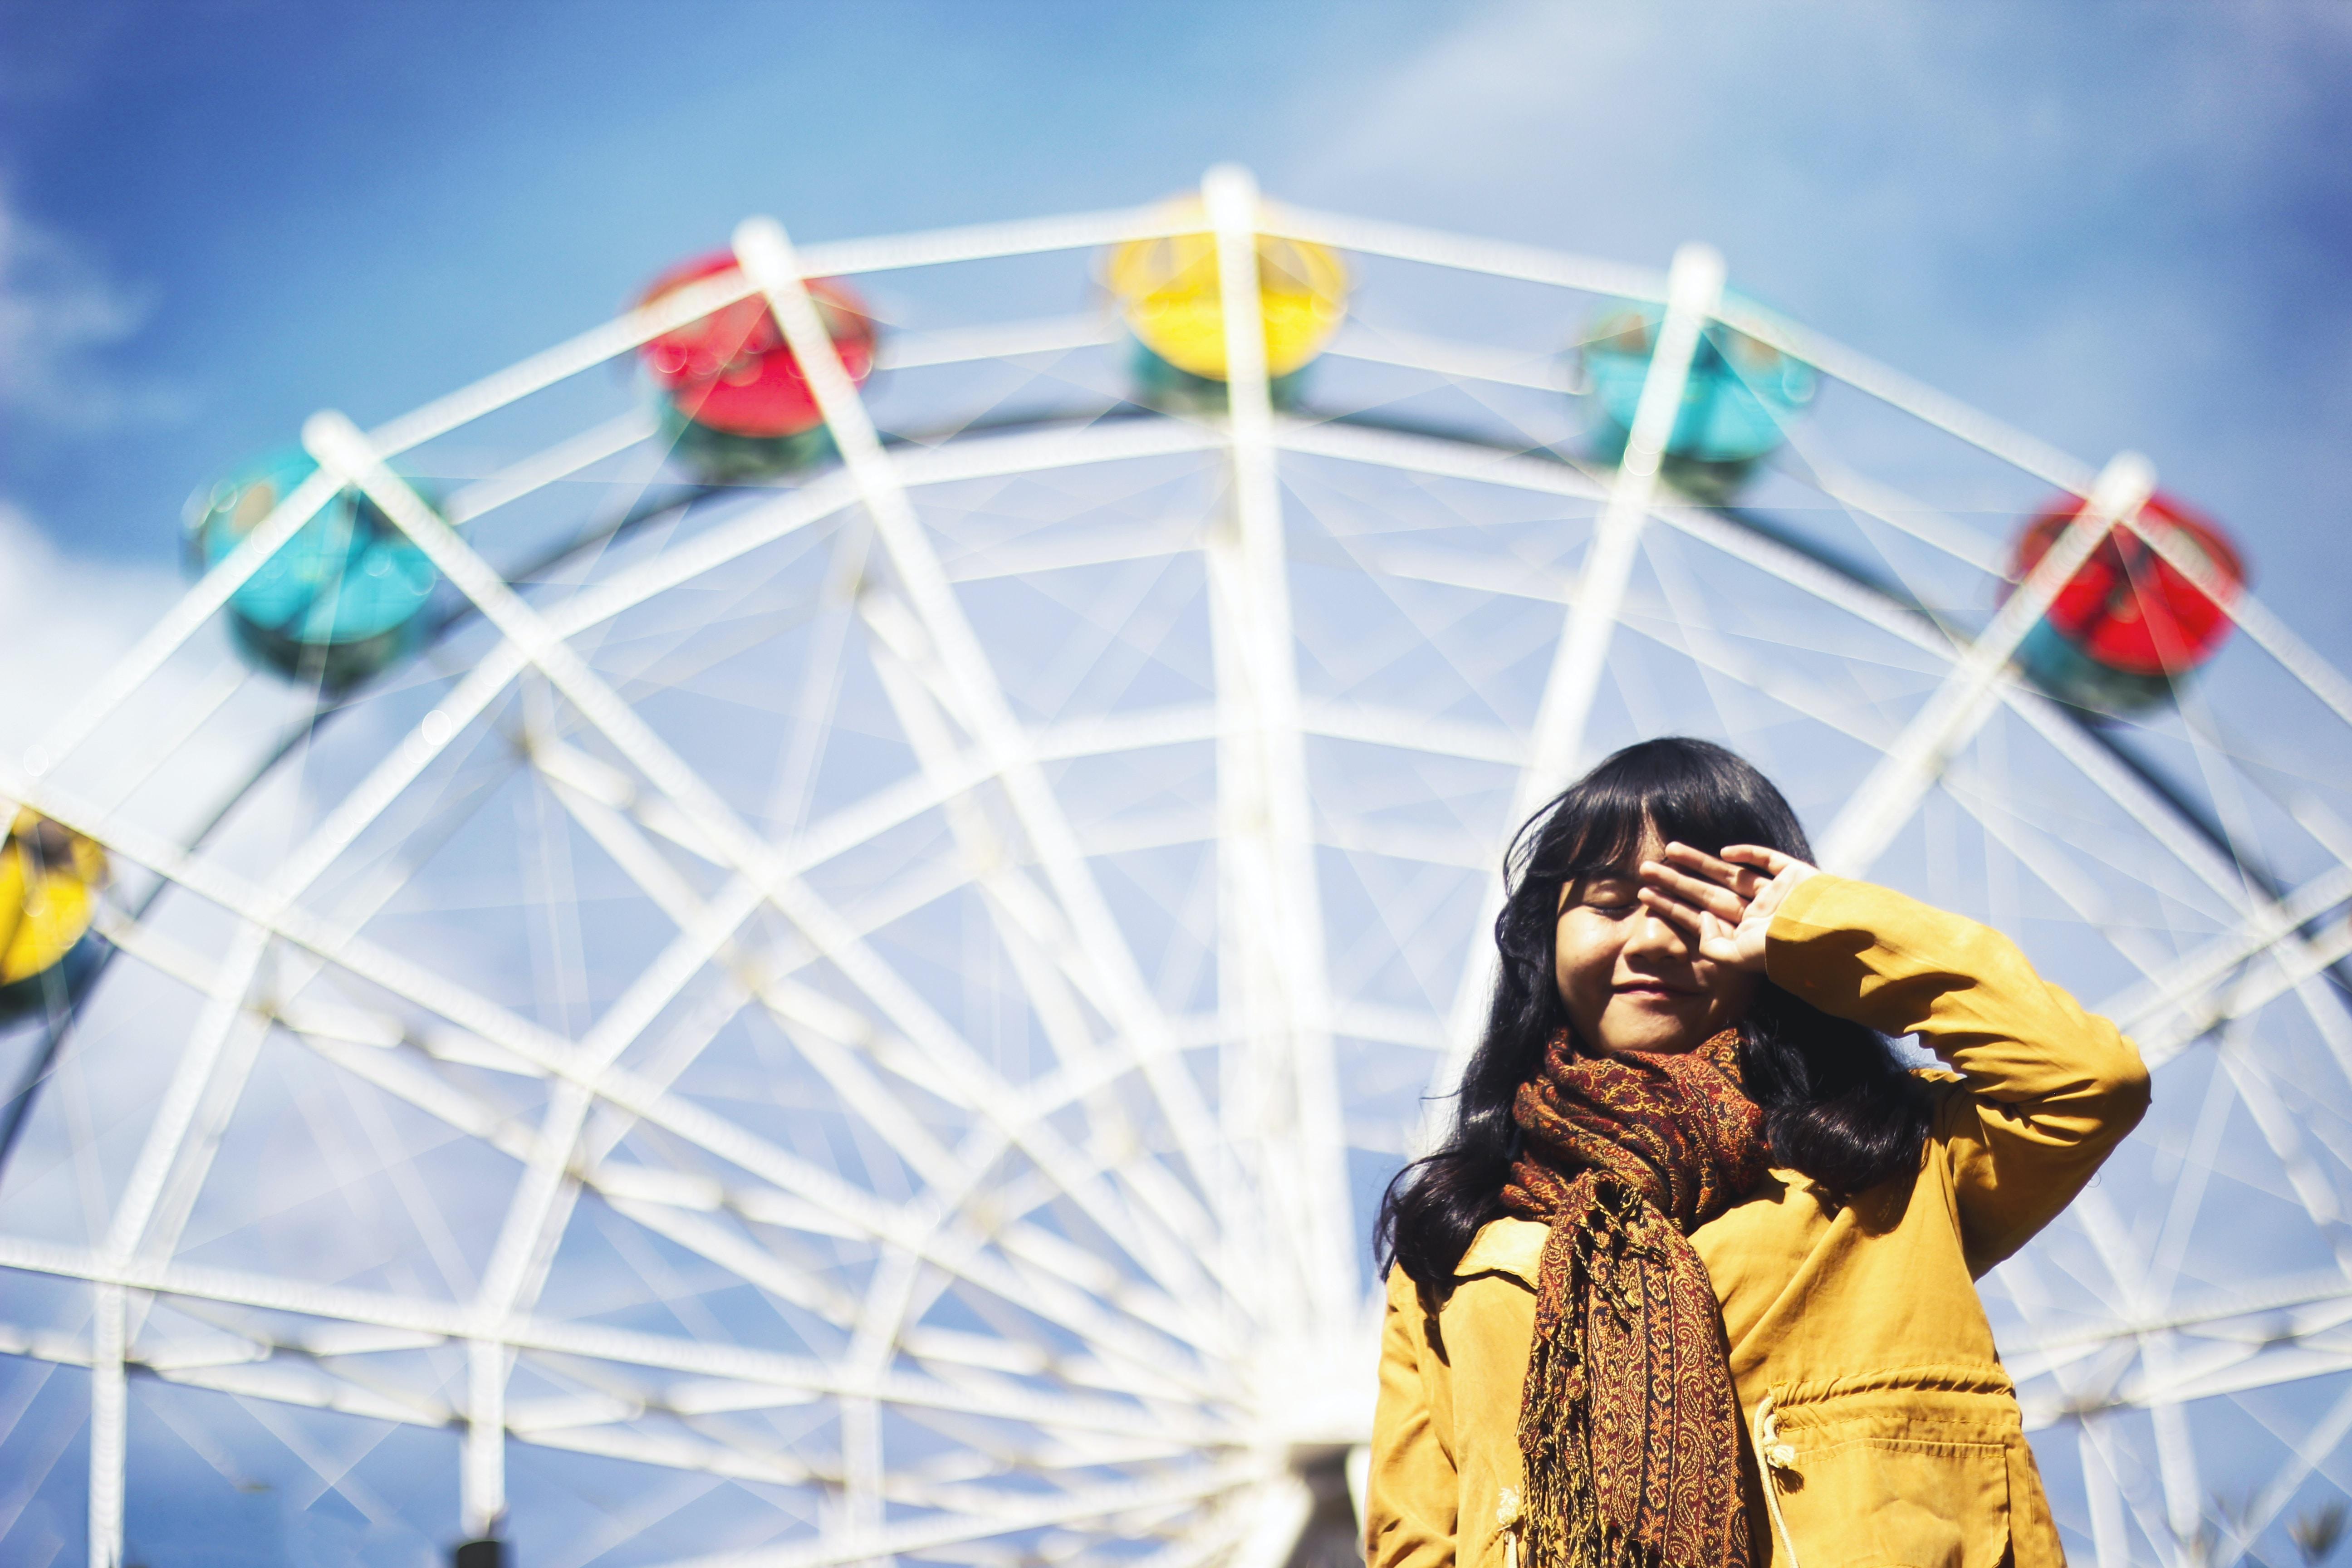 selective focus photo of woman closing left eye near Ferris wheel